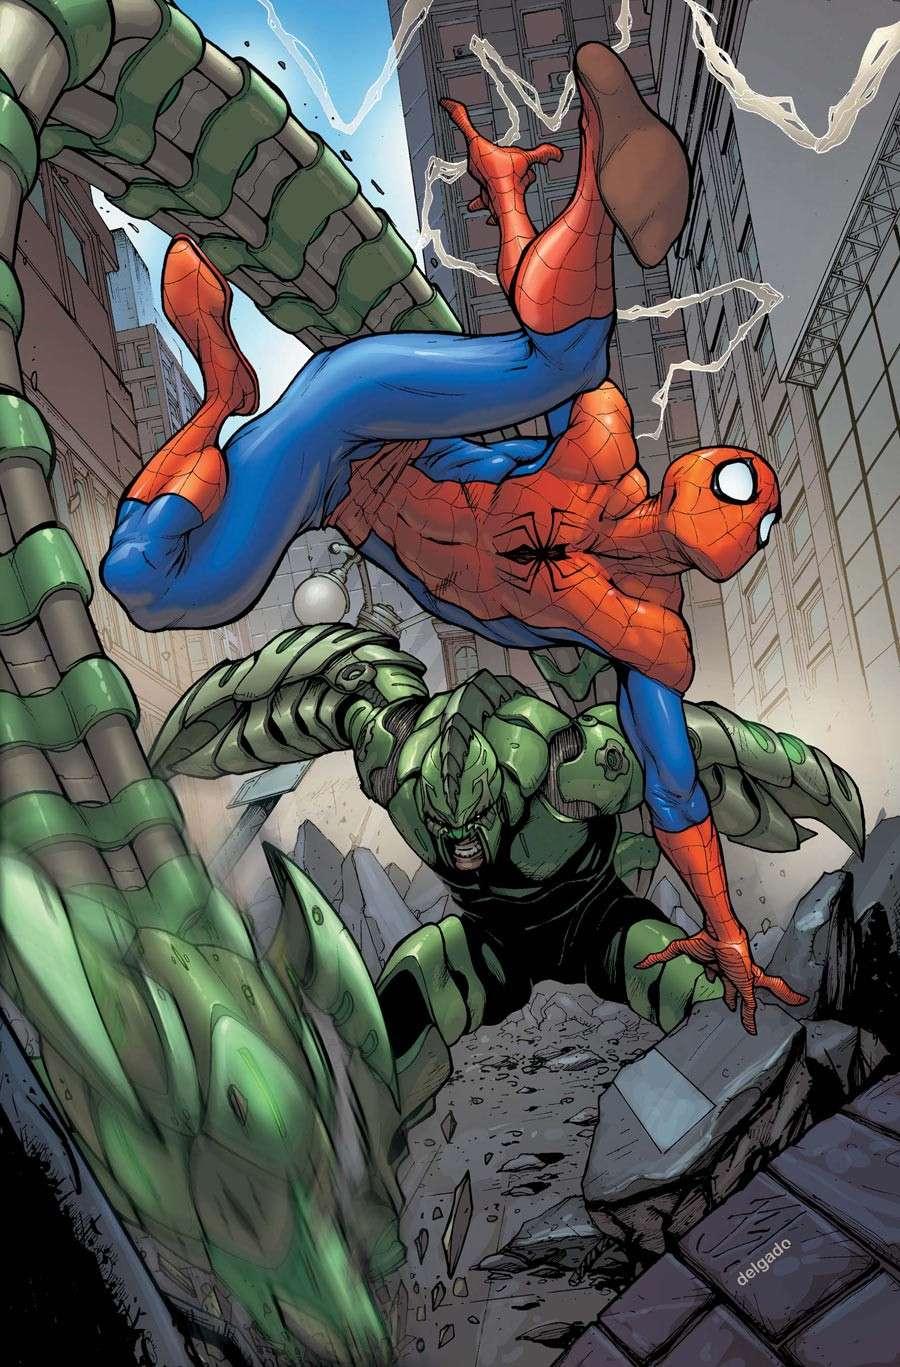 Amazing Spider Man #654 Asm65410